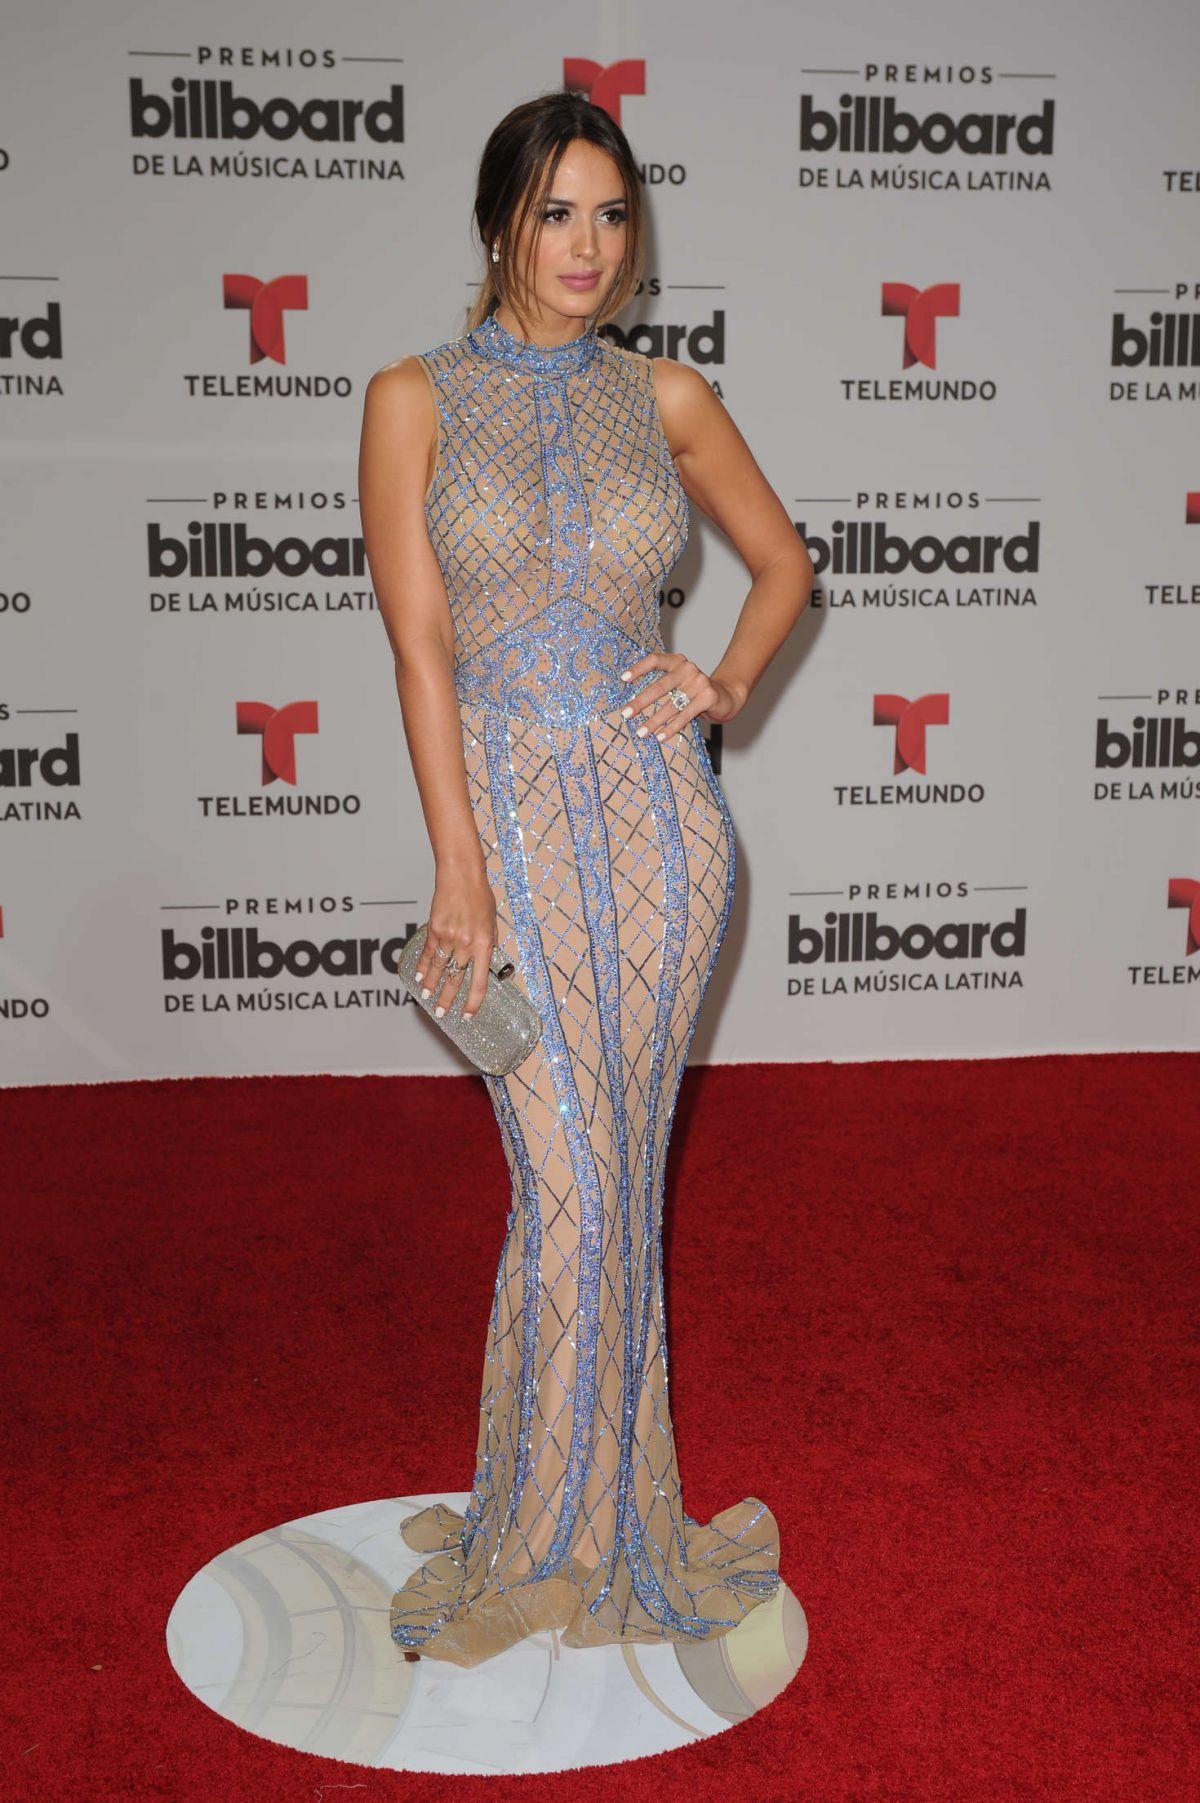 Latin Billboard 106